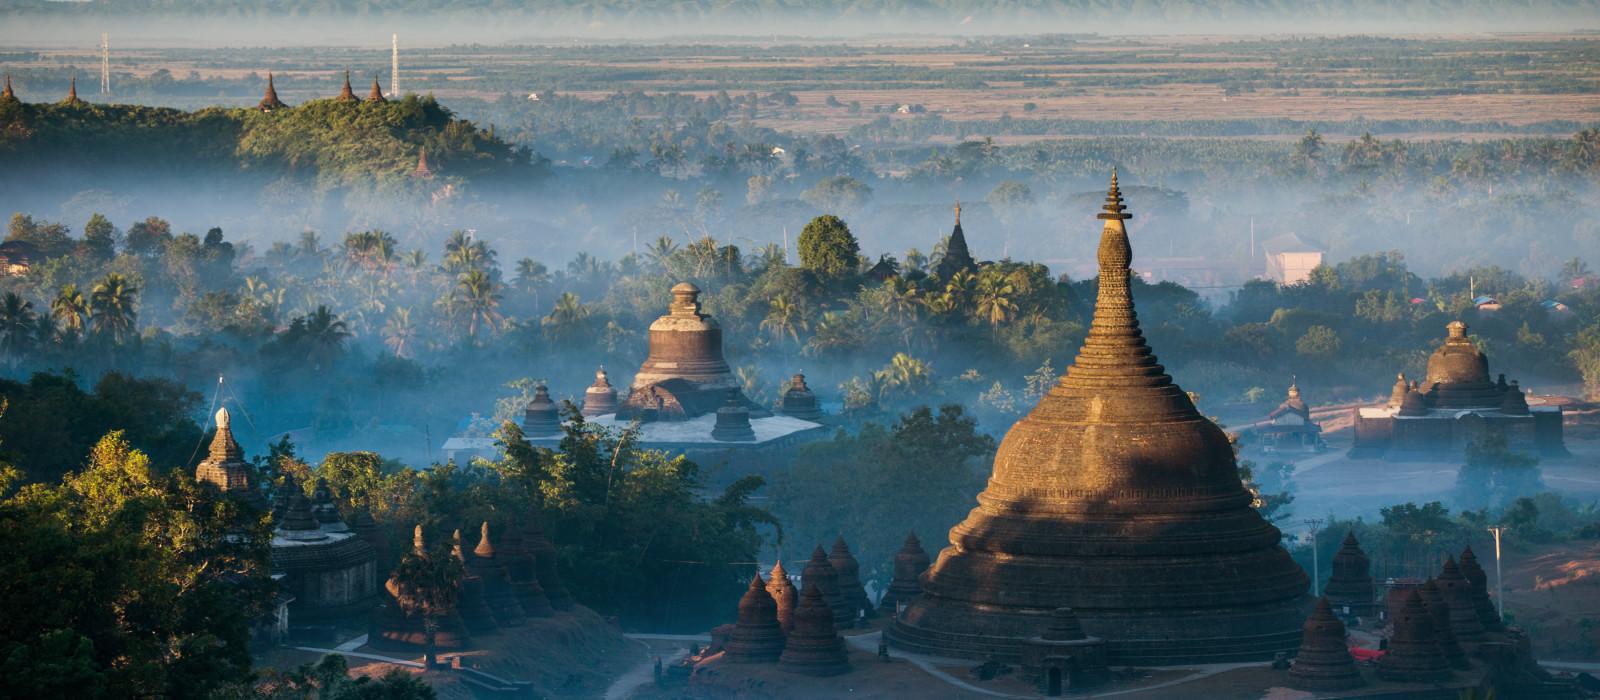 Morgens bei Ratanabon Paya in Mrauk-U, Myanmar, Asien.